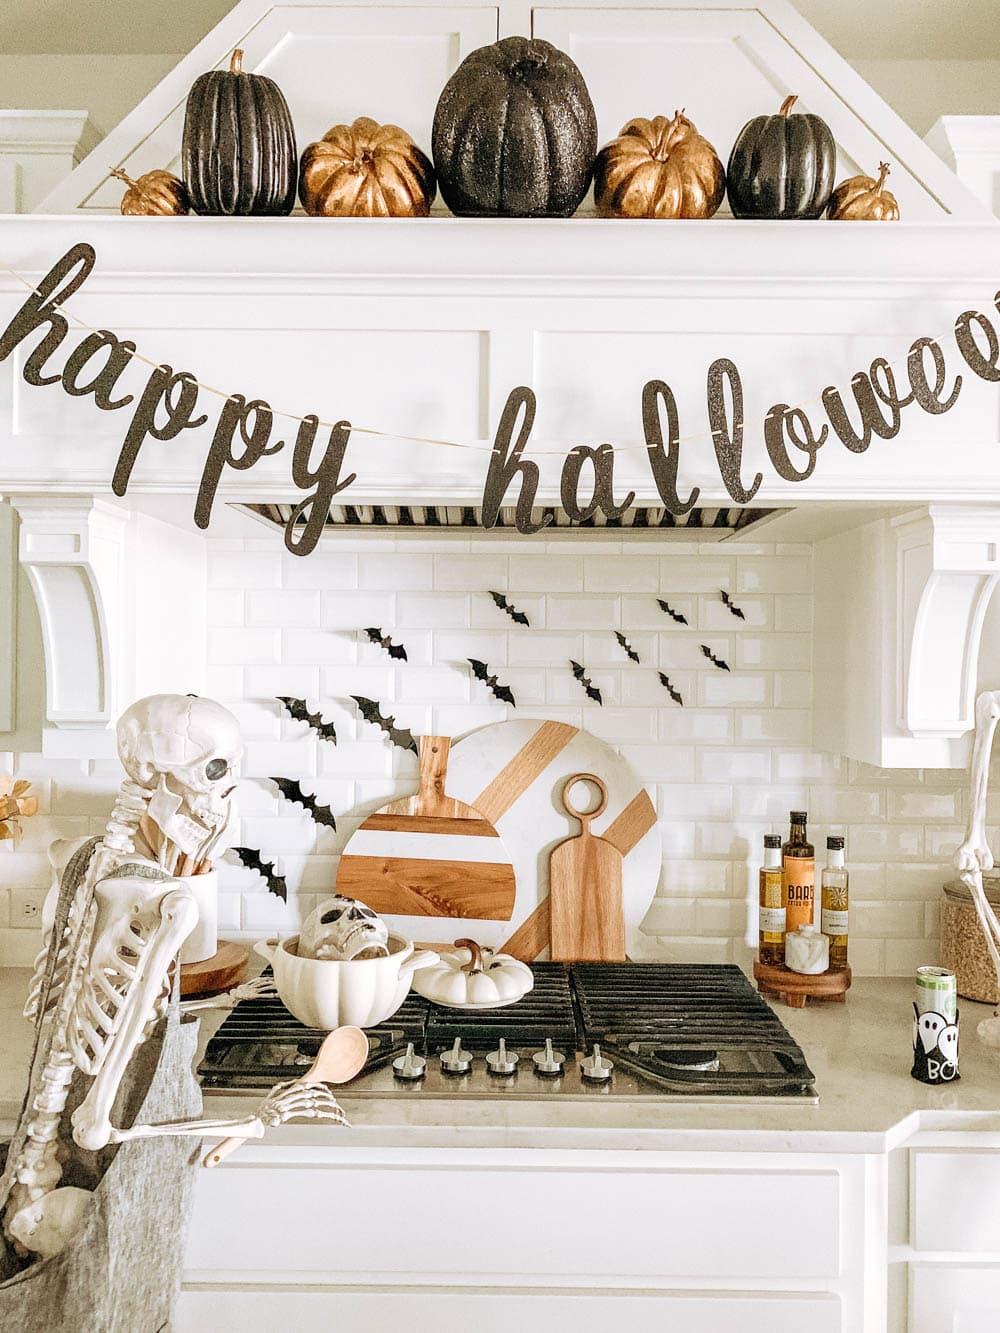 Simple + Easy Halloween decor ideas. Skeletons, pumpkins, flying bats. #ABlissfulNest #halloween #halloweendecor